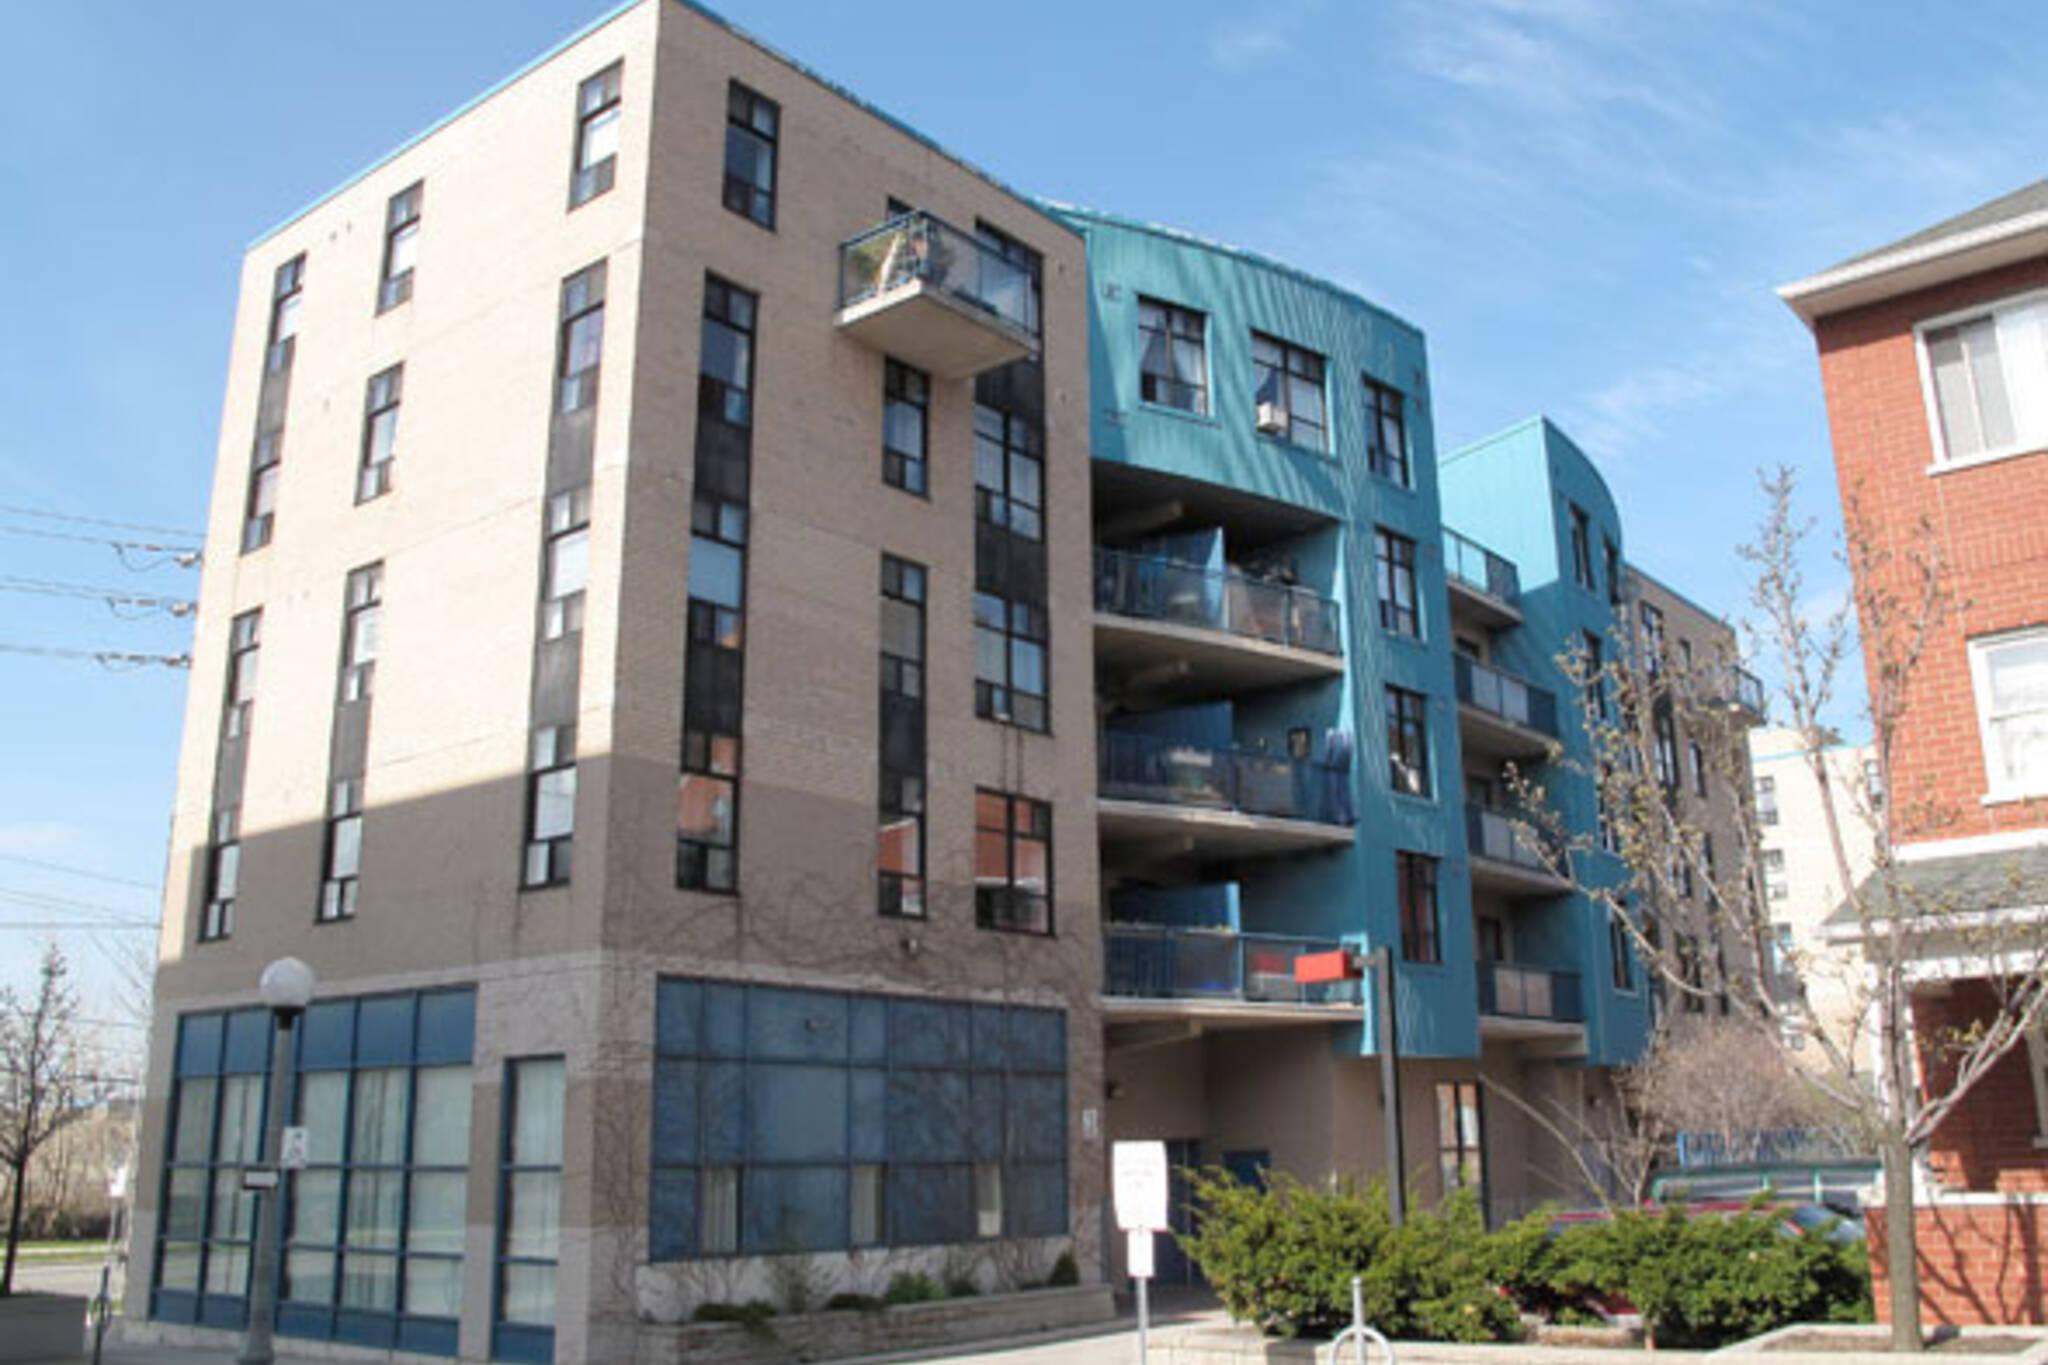 Habitats: Lakeshore live-work building